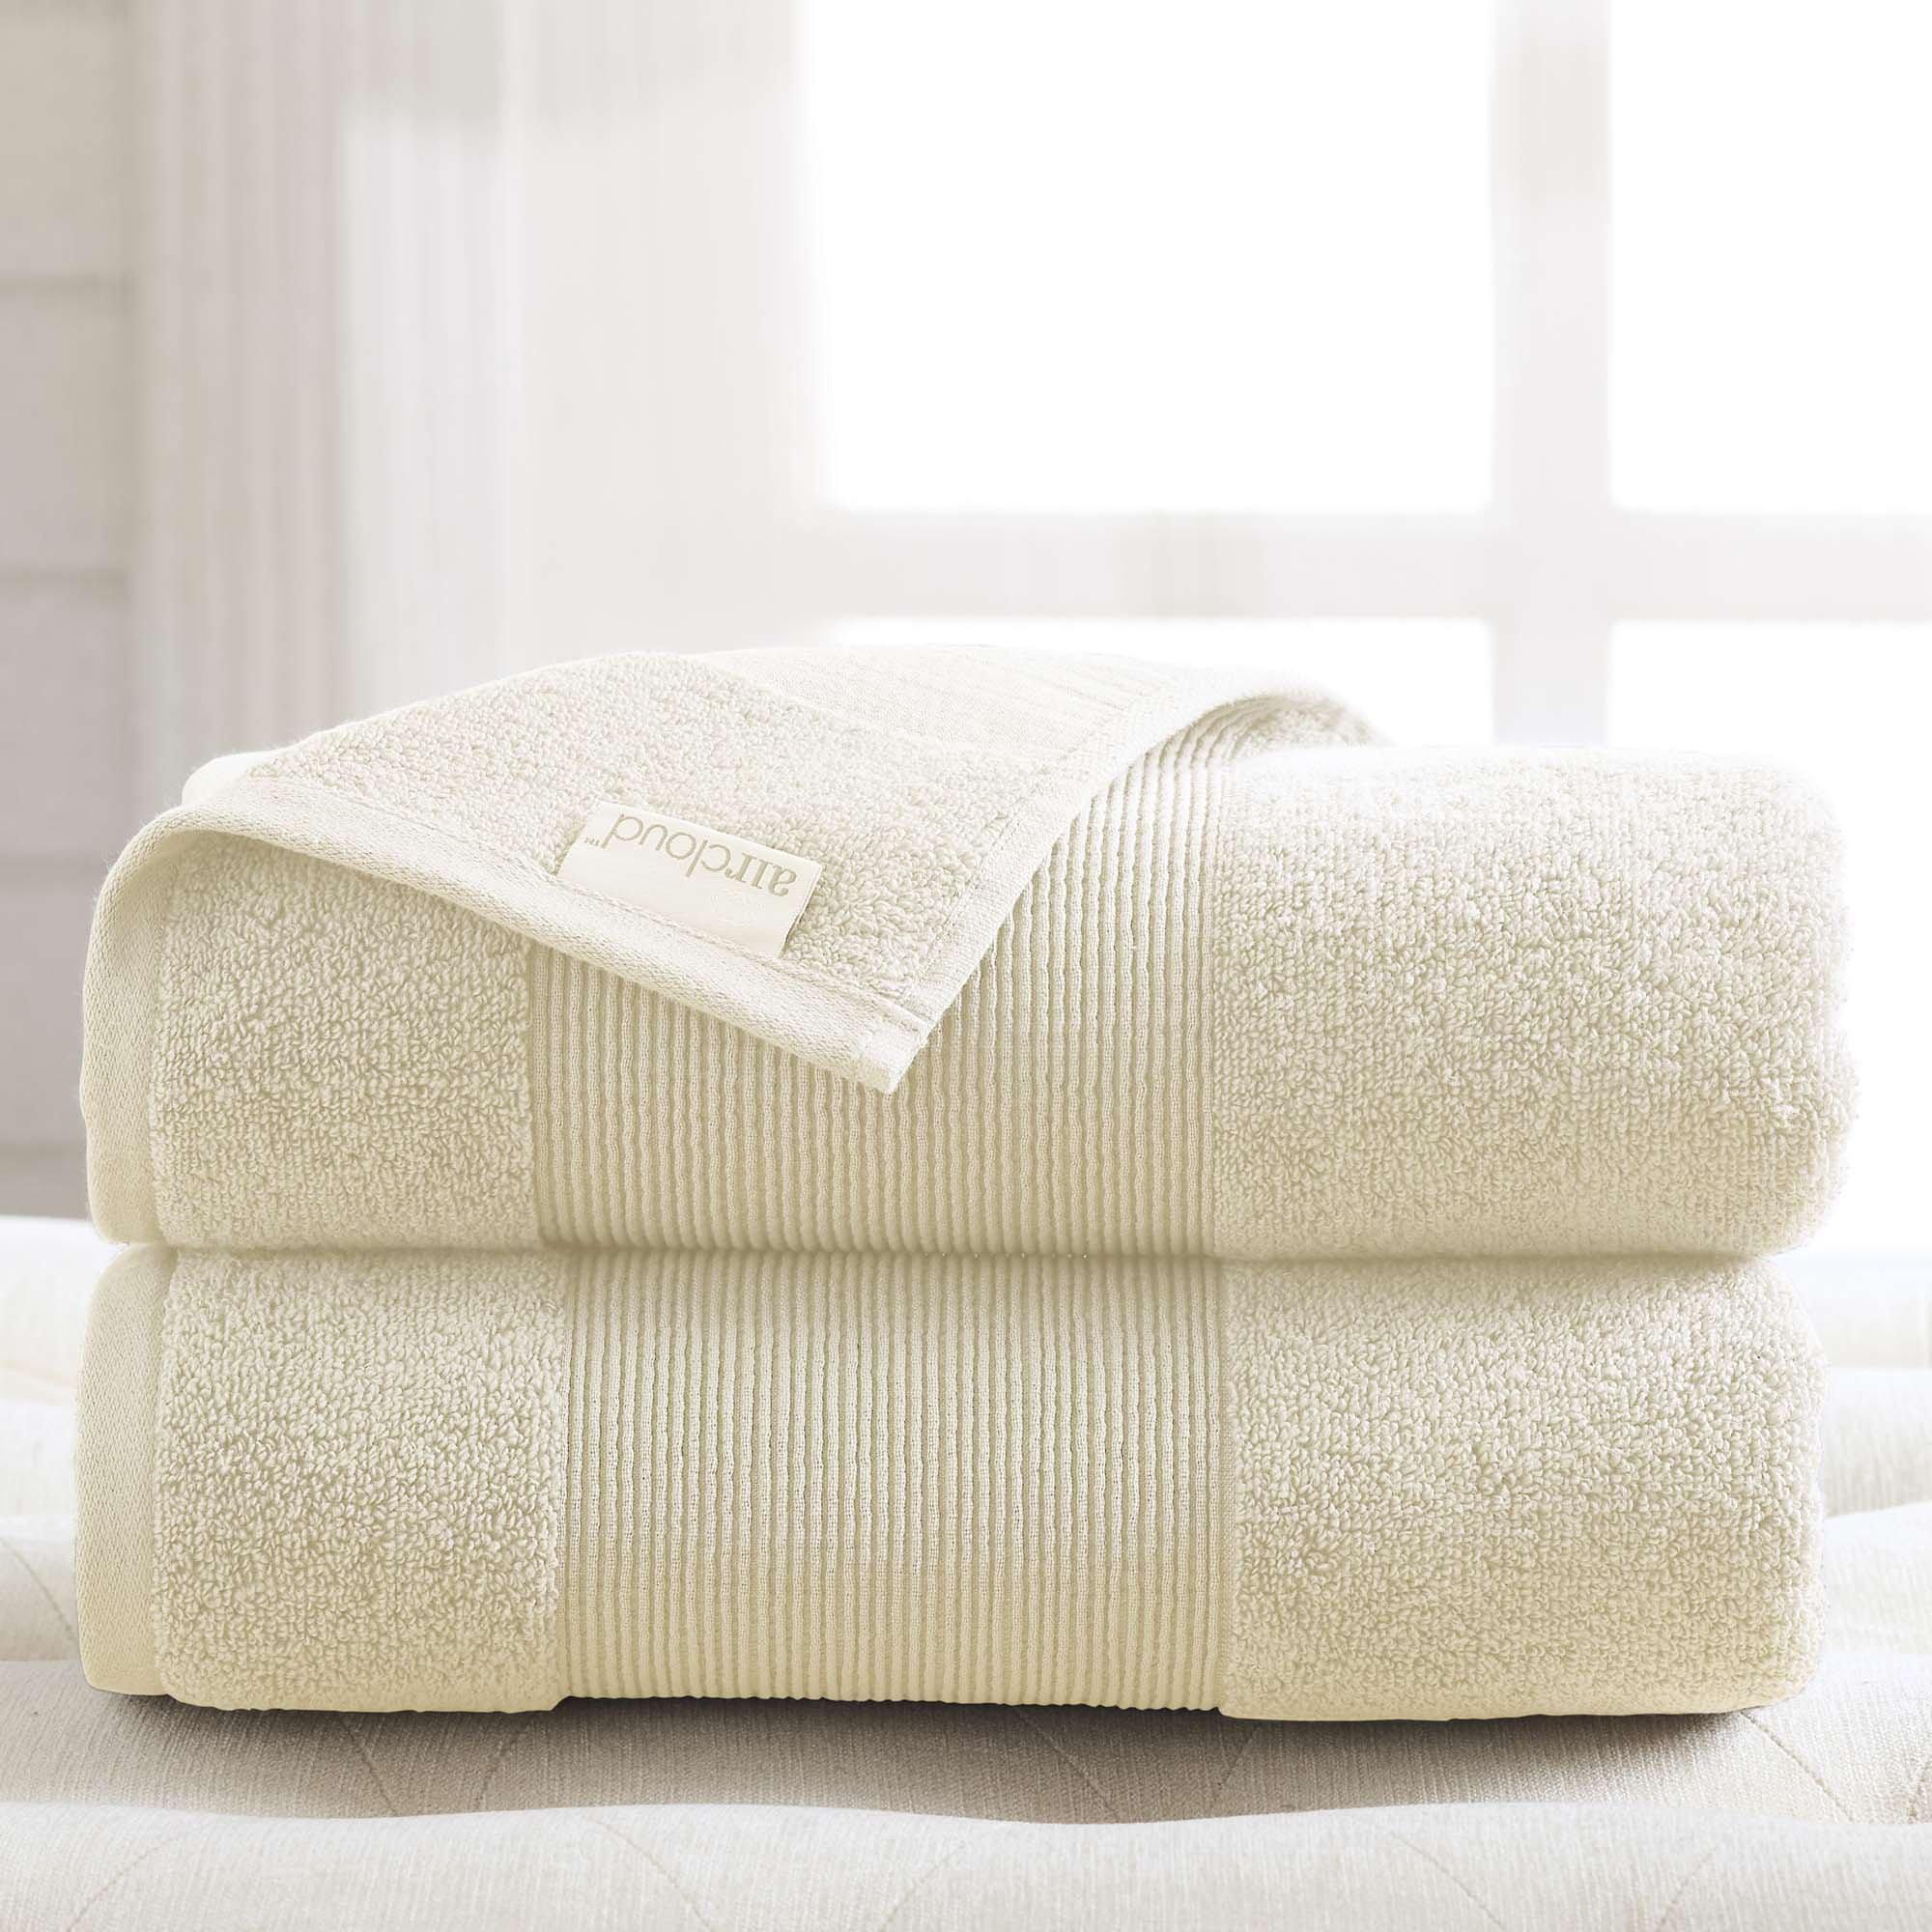 Amrapur Overseas Air Cloud 100-Percent Combed Cotton Oversized Bath Sheet Set, 2-Piece, Ivory